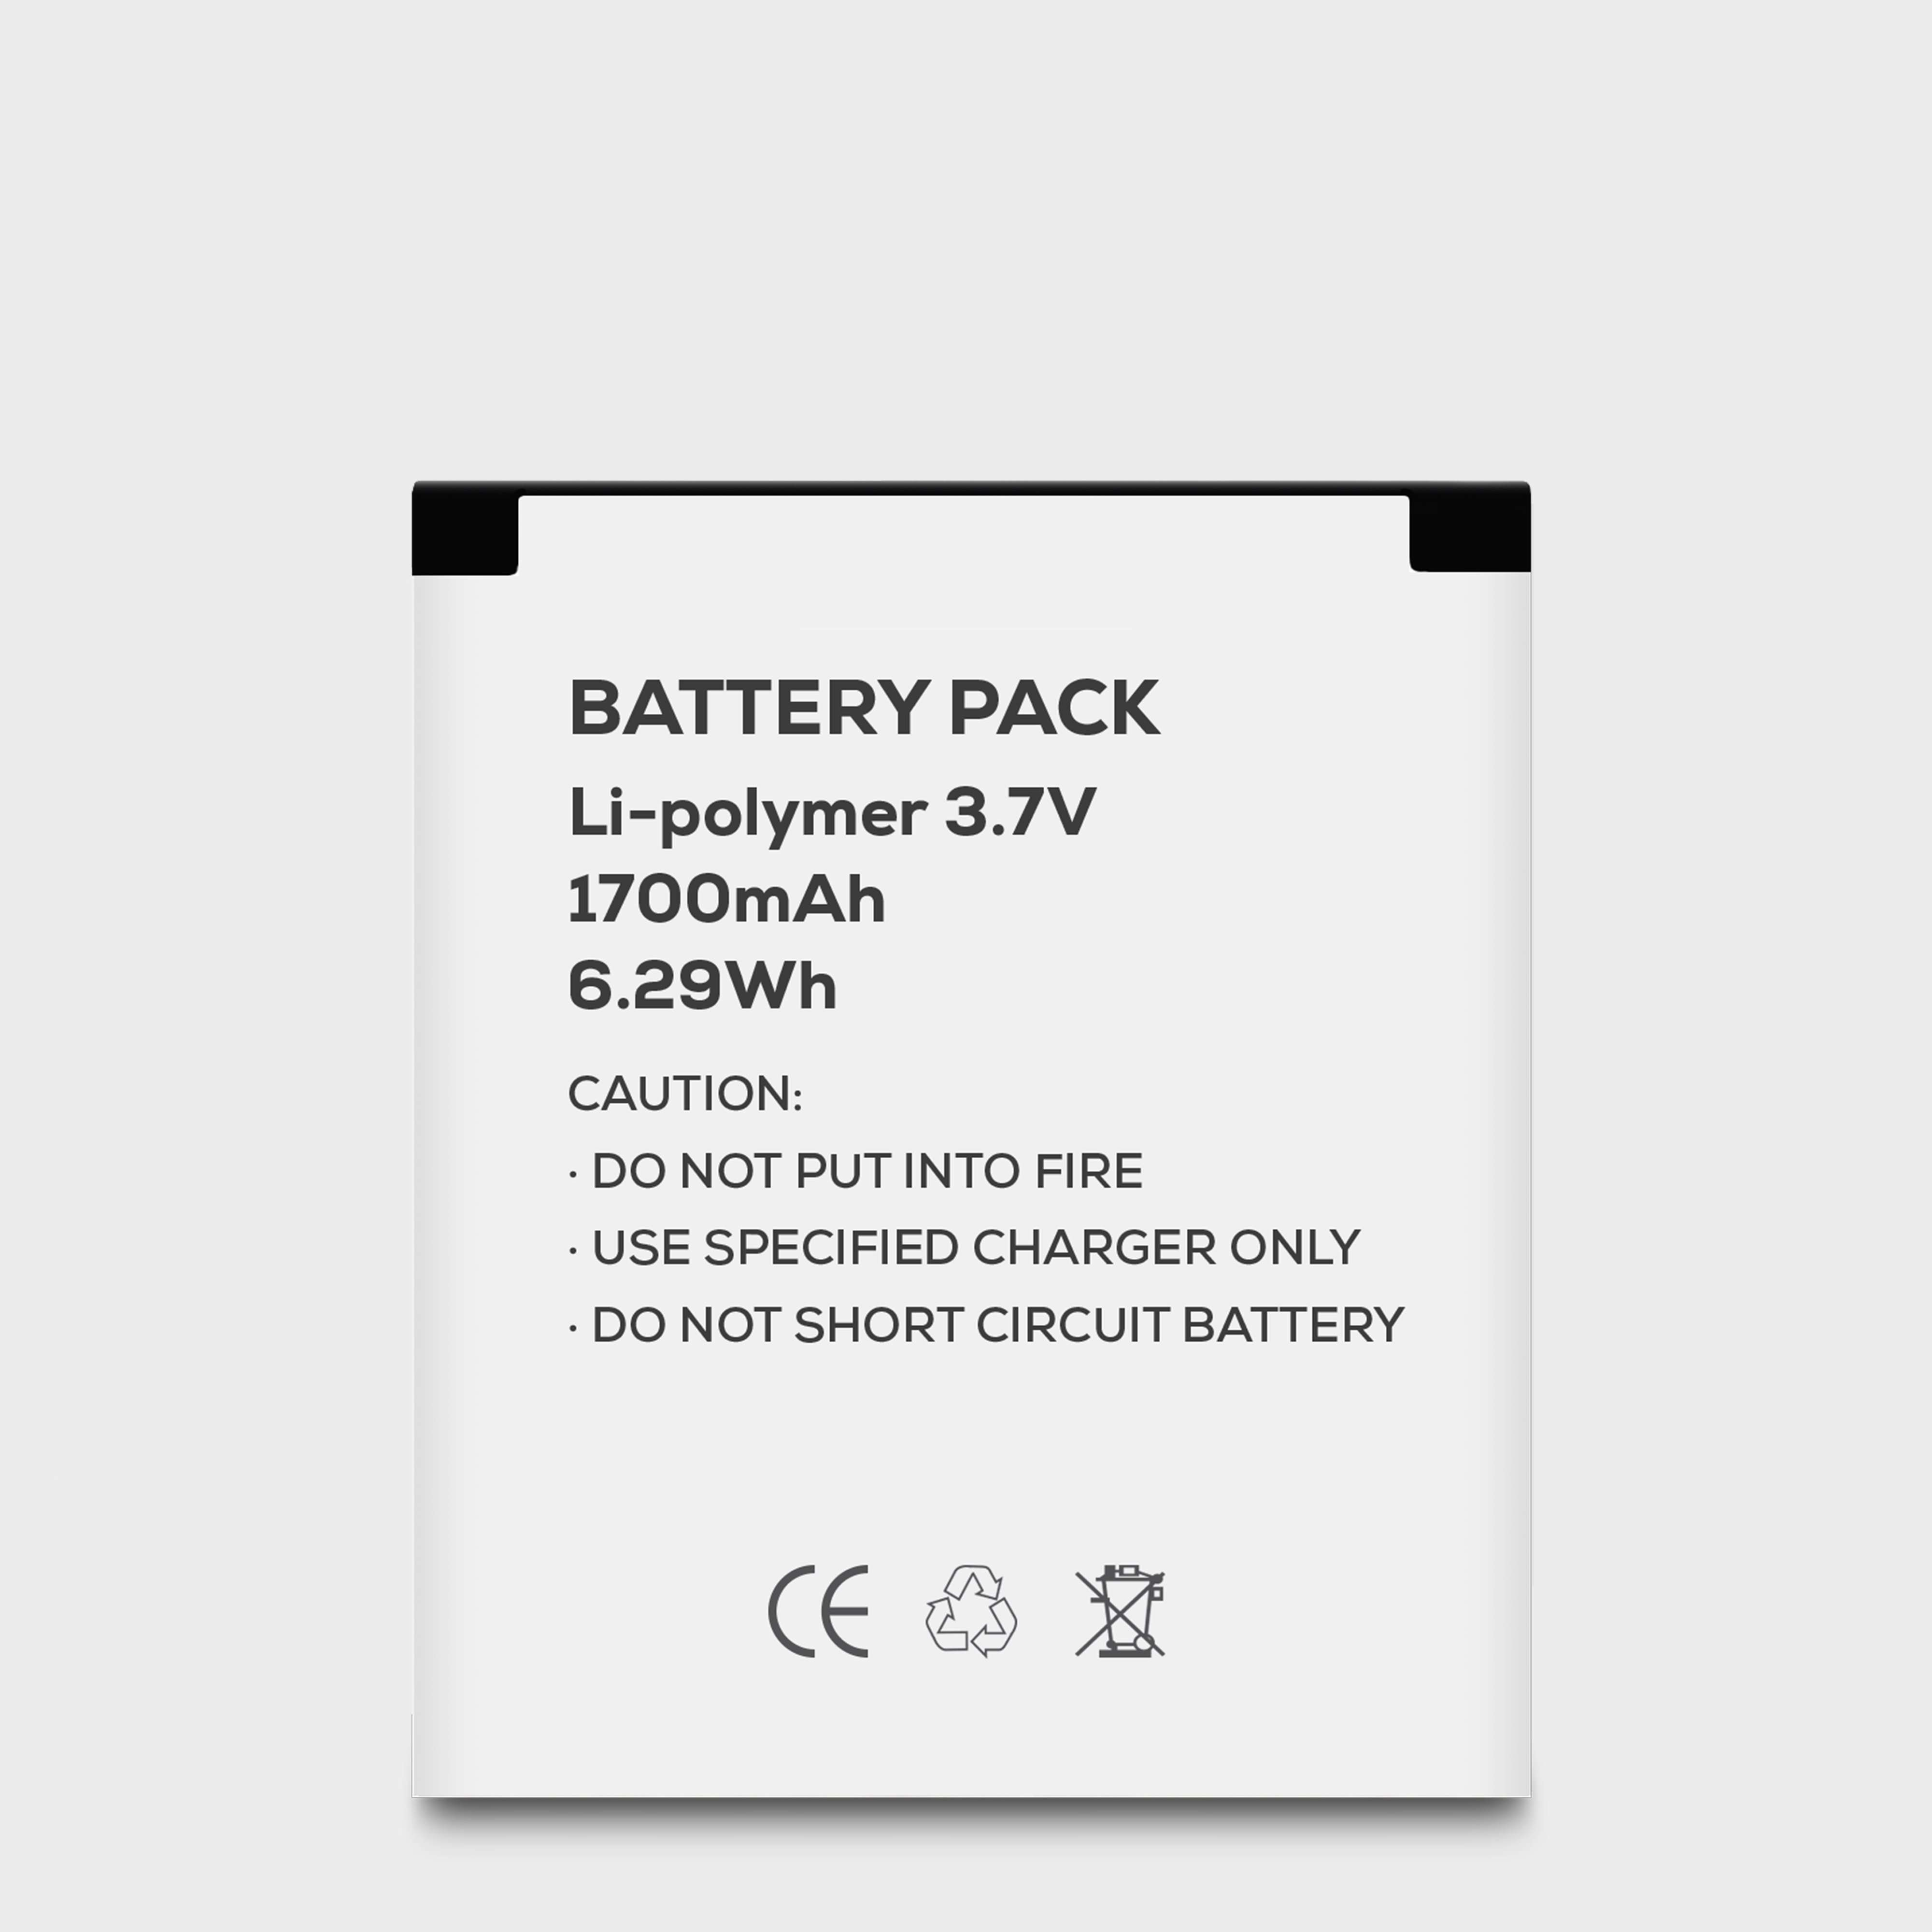 ORDNANCE SURVEY Horizon Spare Battery